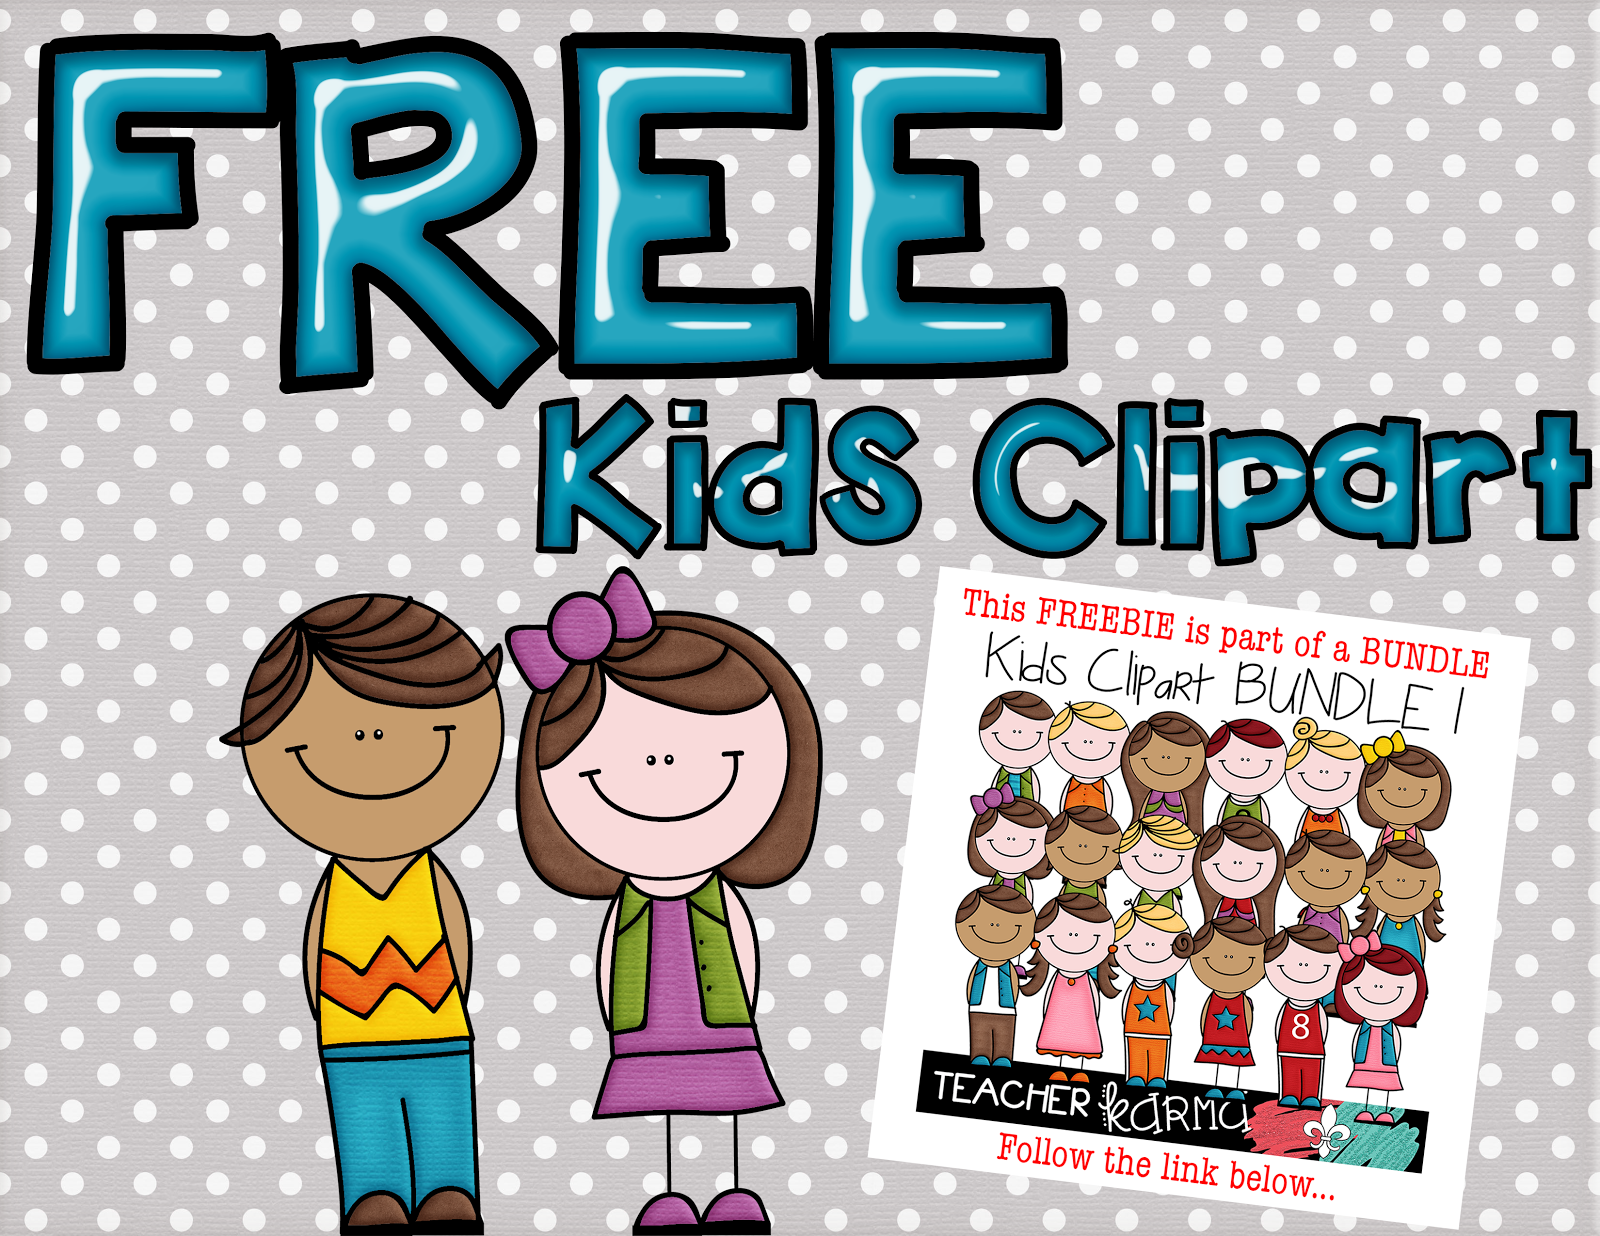 medium resolution of free clipart for teachers teacherkarma com student clipart free clipart for teachers